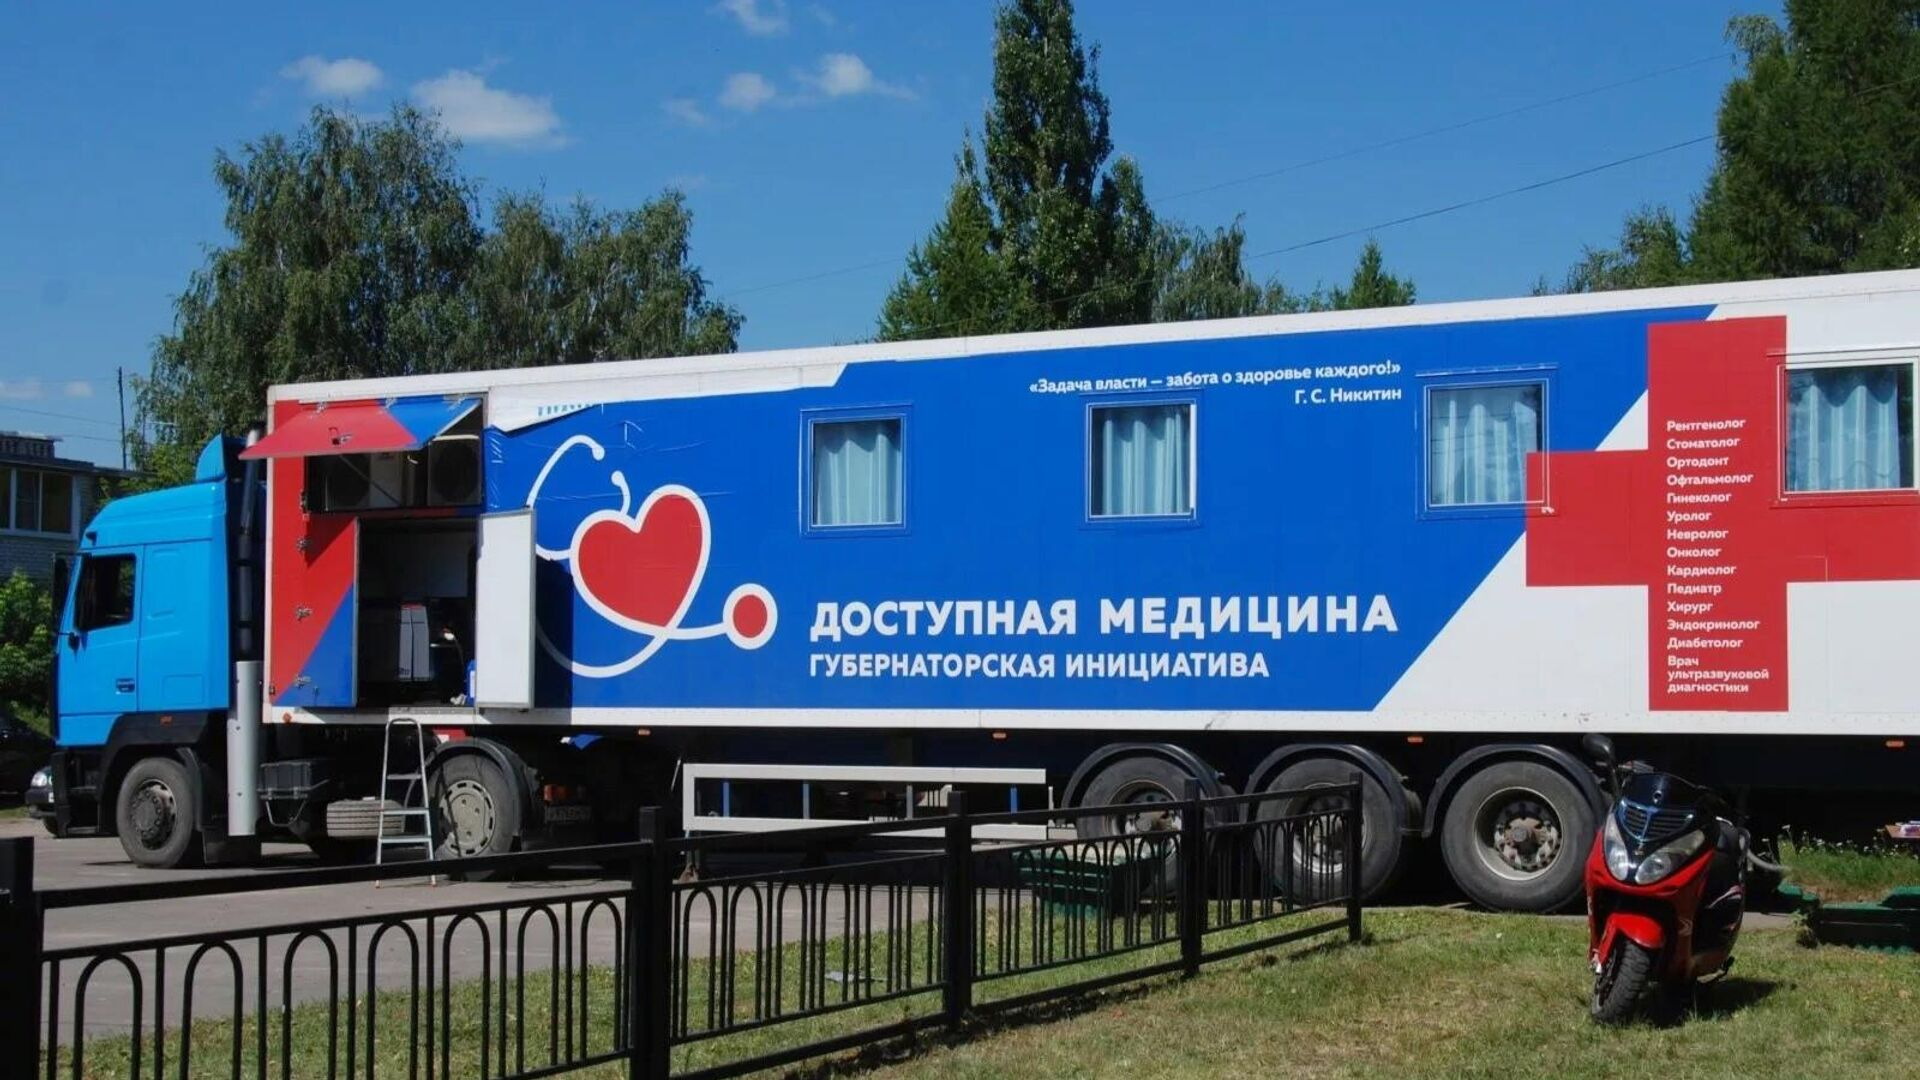 Предприятие под Нижним Новгородом получит заем на 1,5 миллиарда рублей